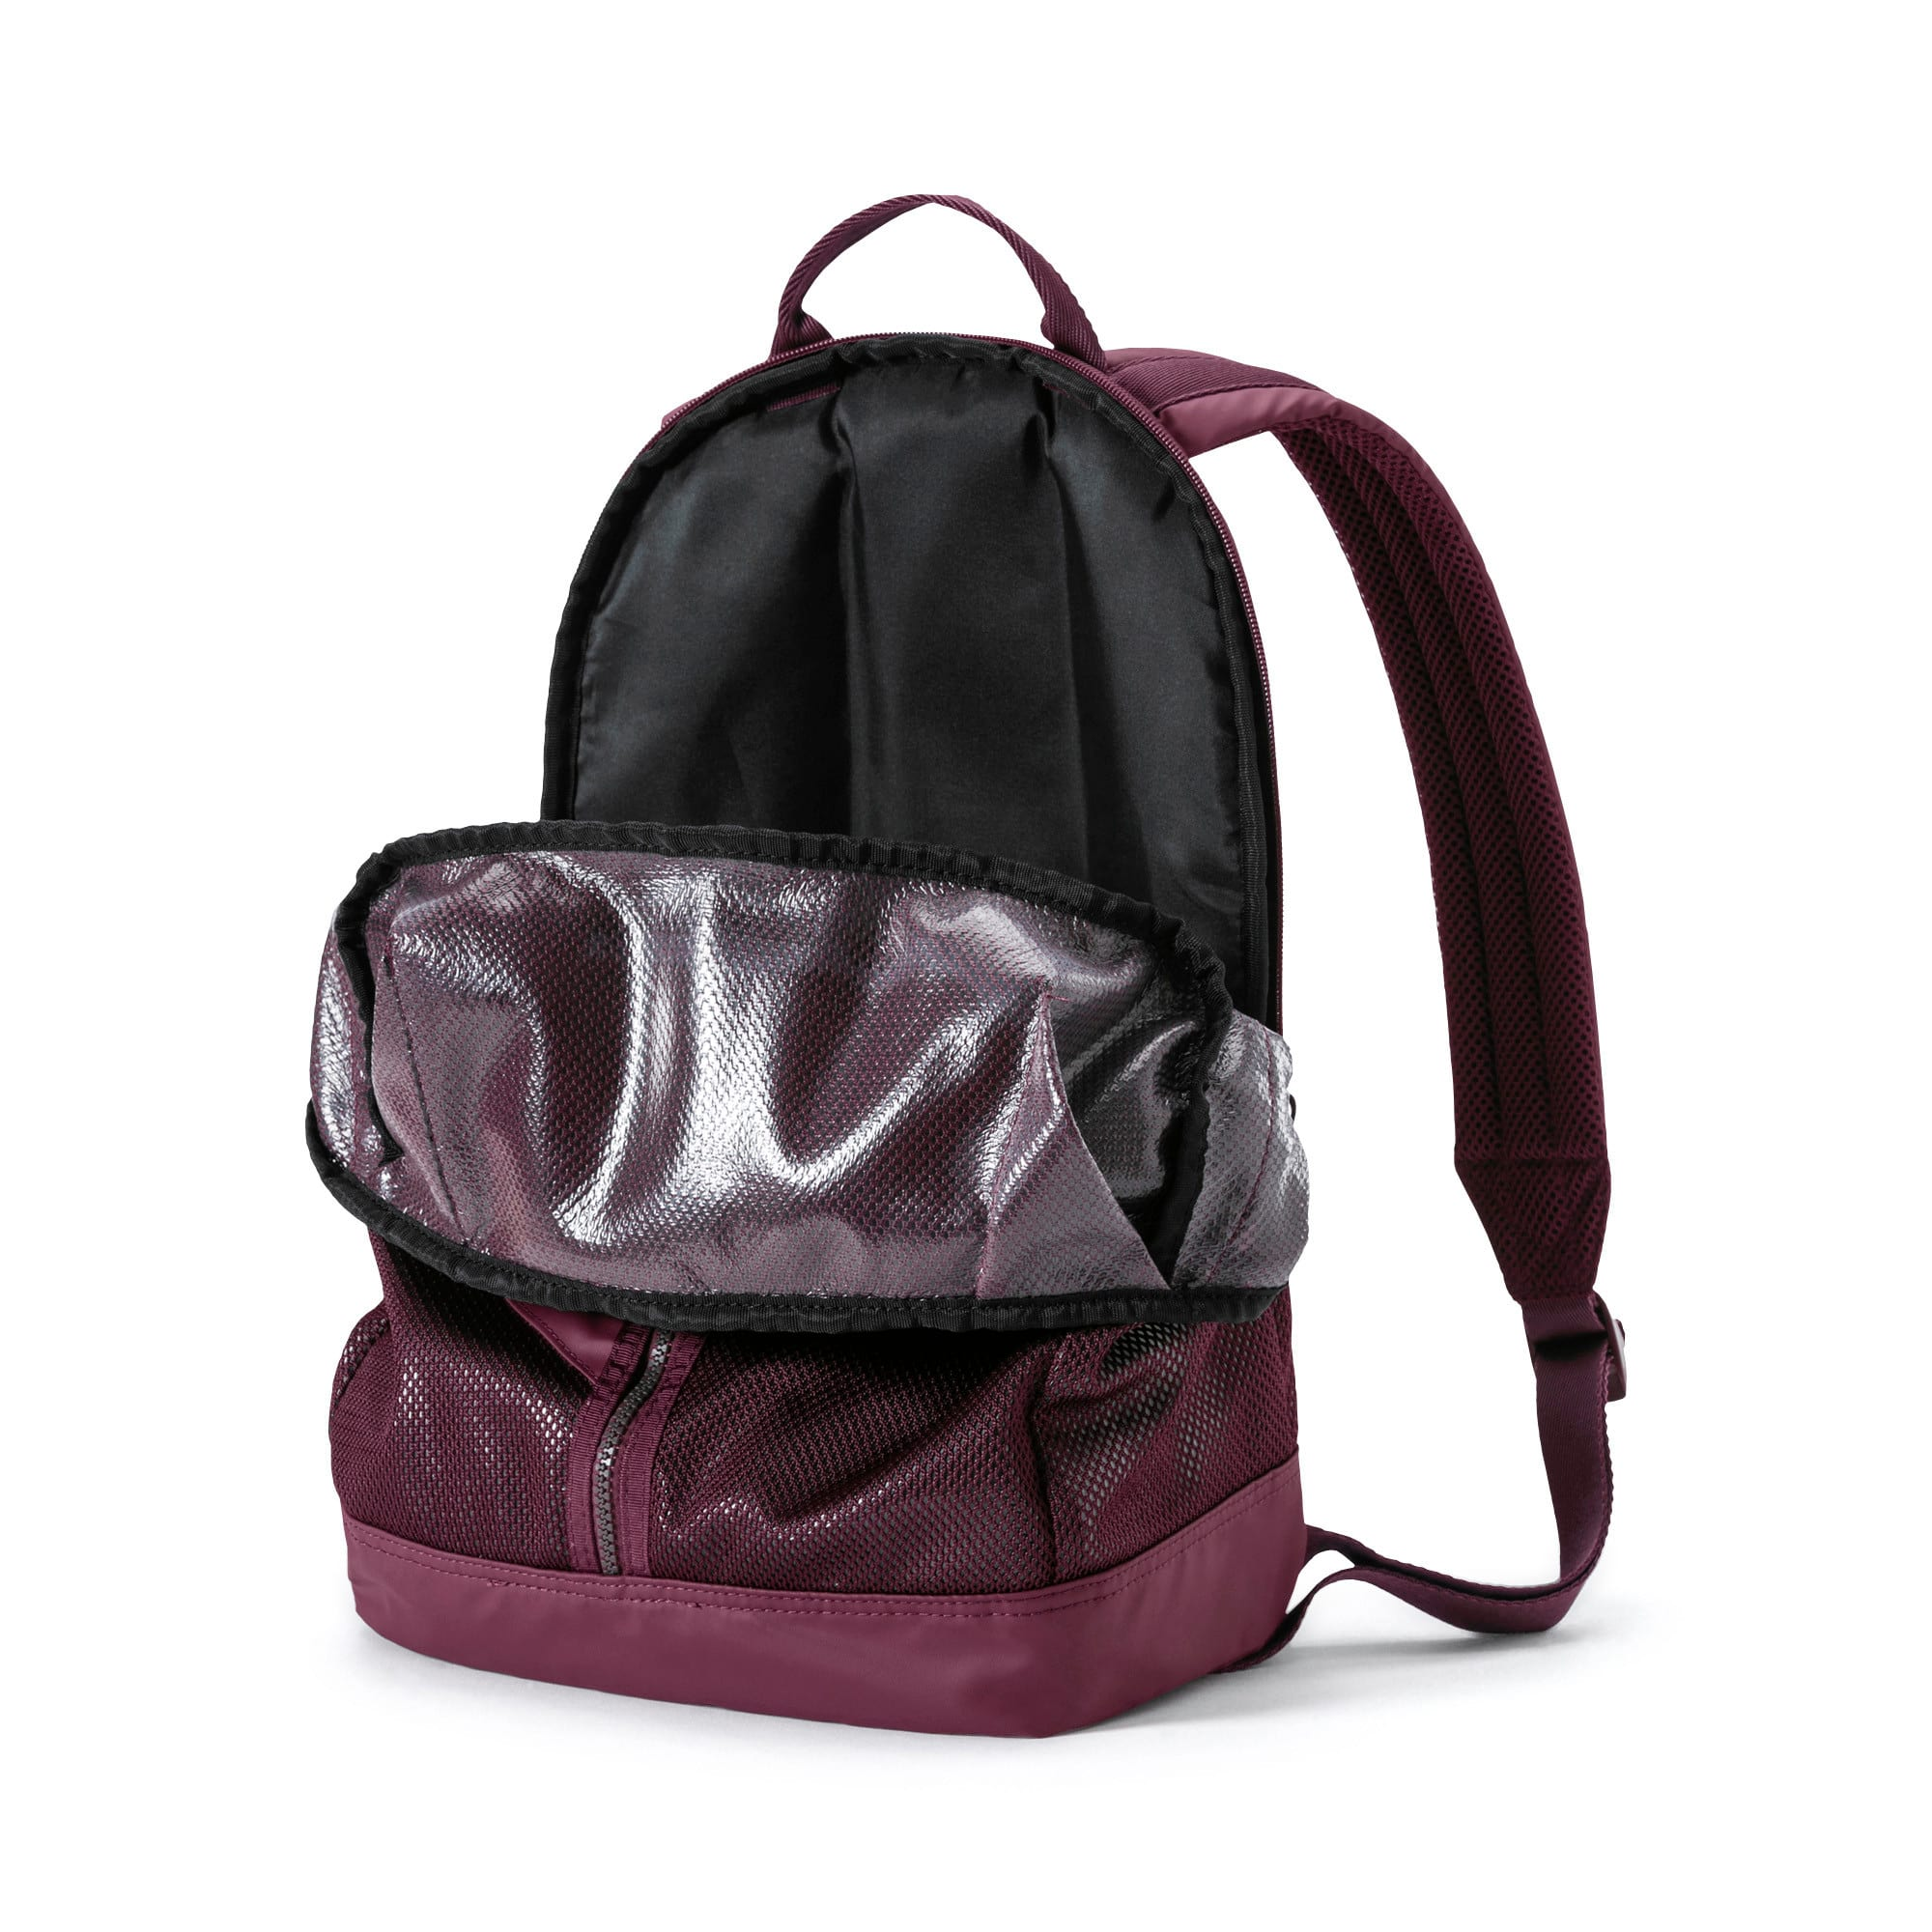 Thumbnail 3 of Ambition Women's Backpack, Fig-Bronze-metallic, medium